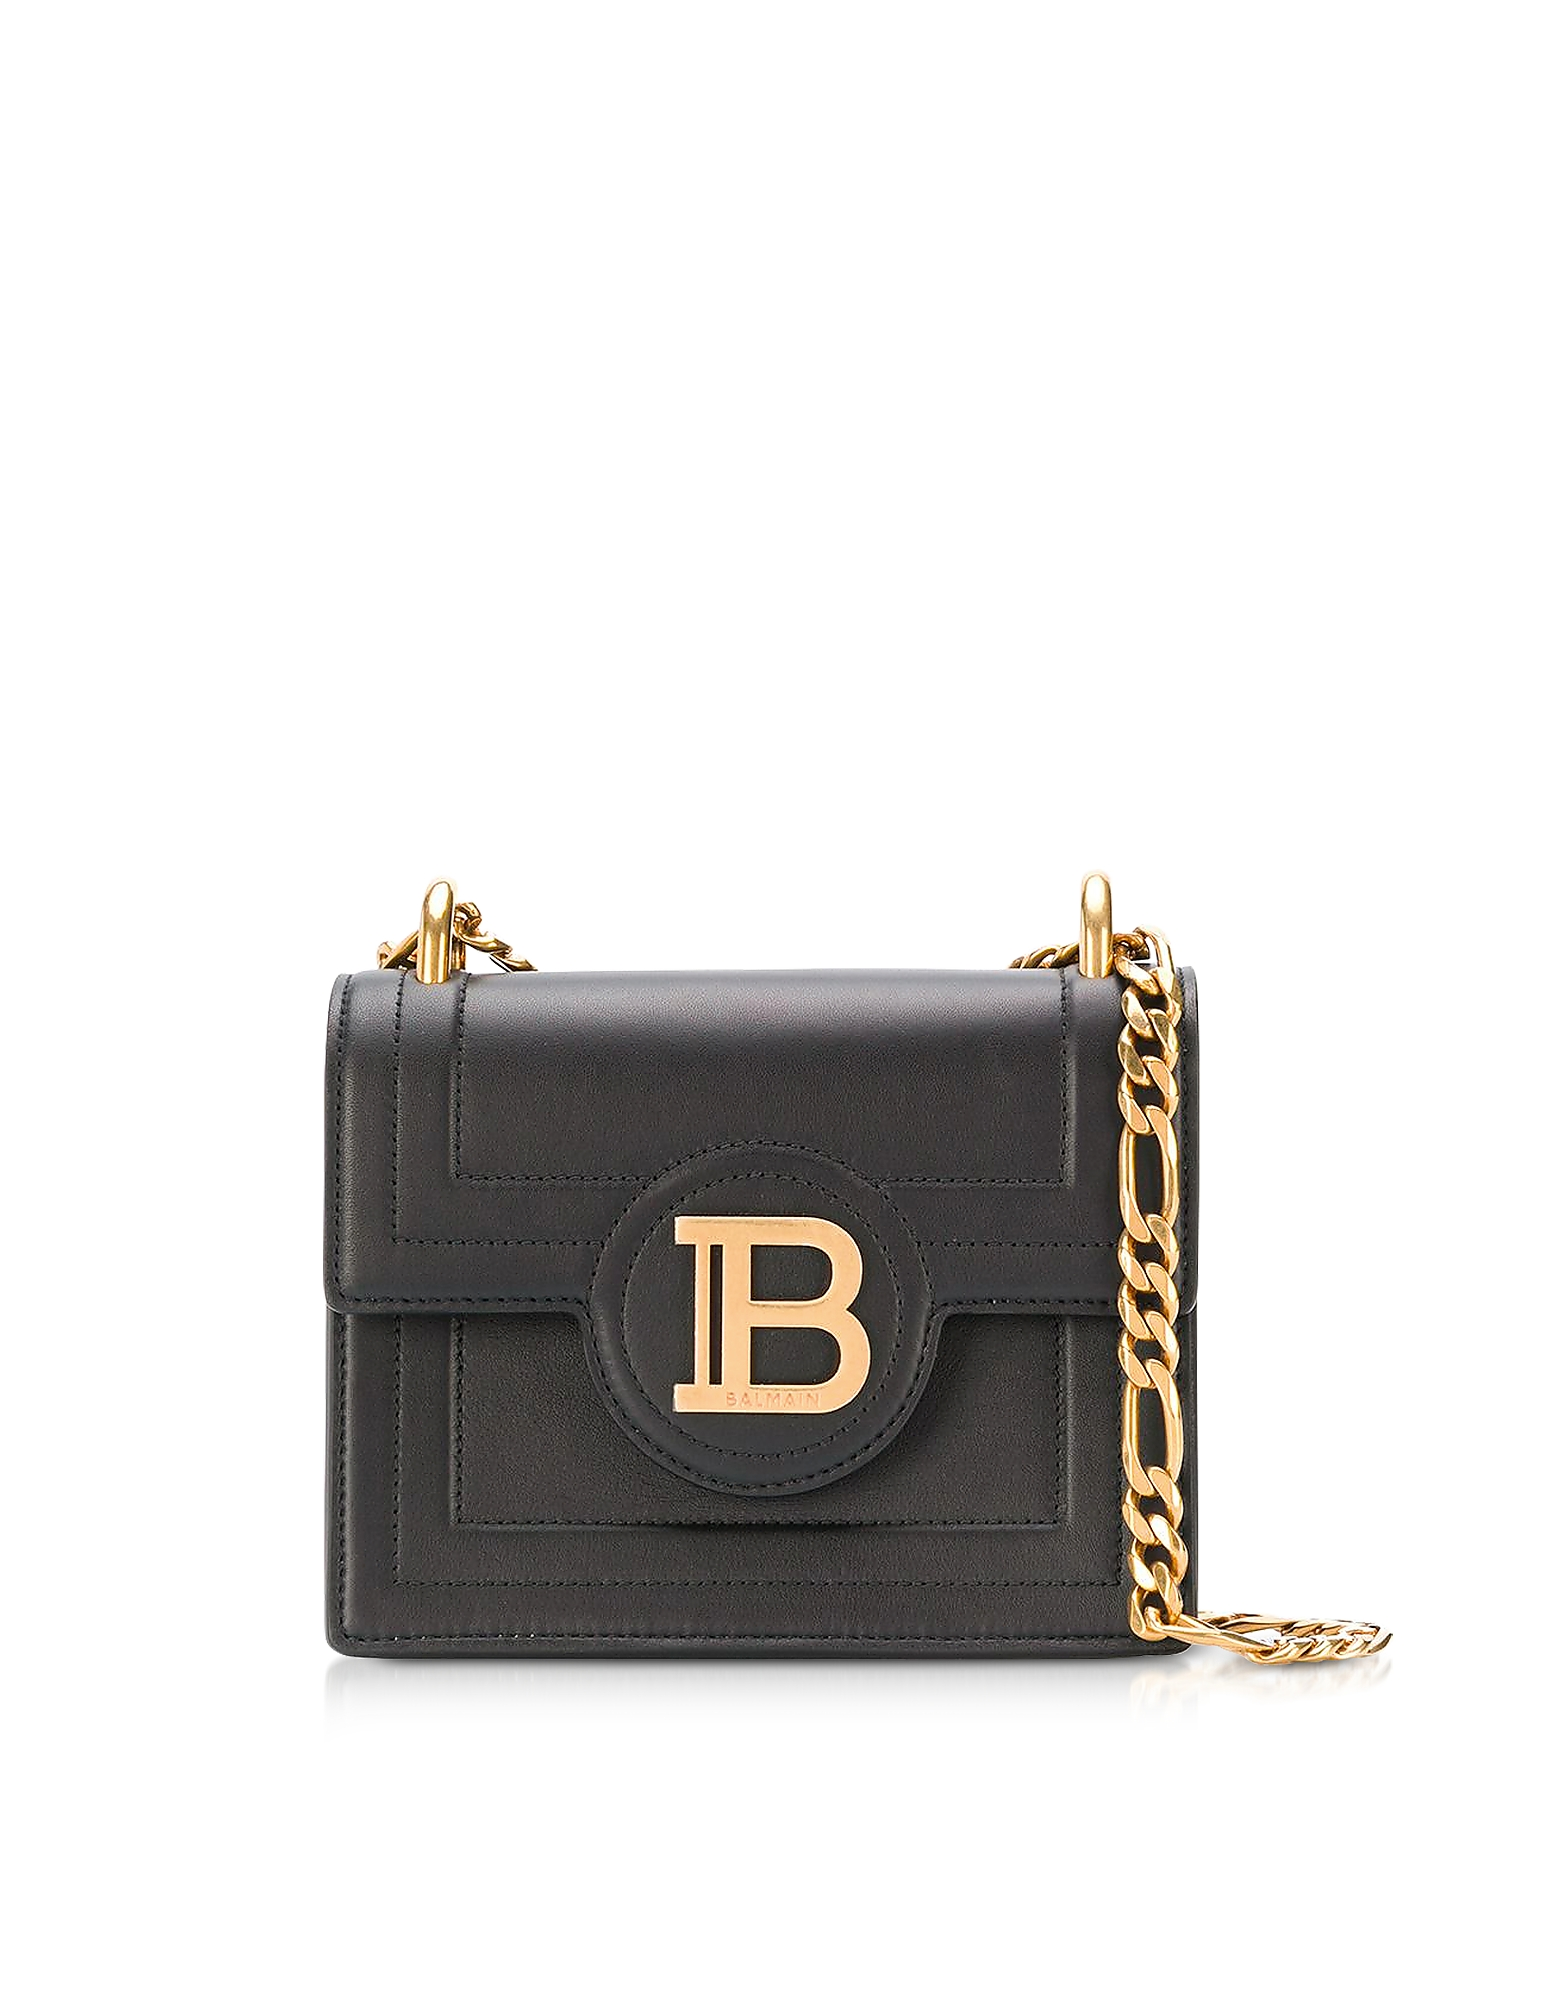 Balmain Designer Handbags, Black Leather 18 B-Bag